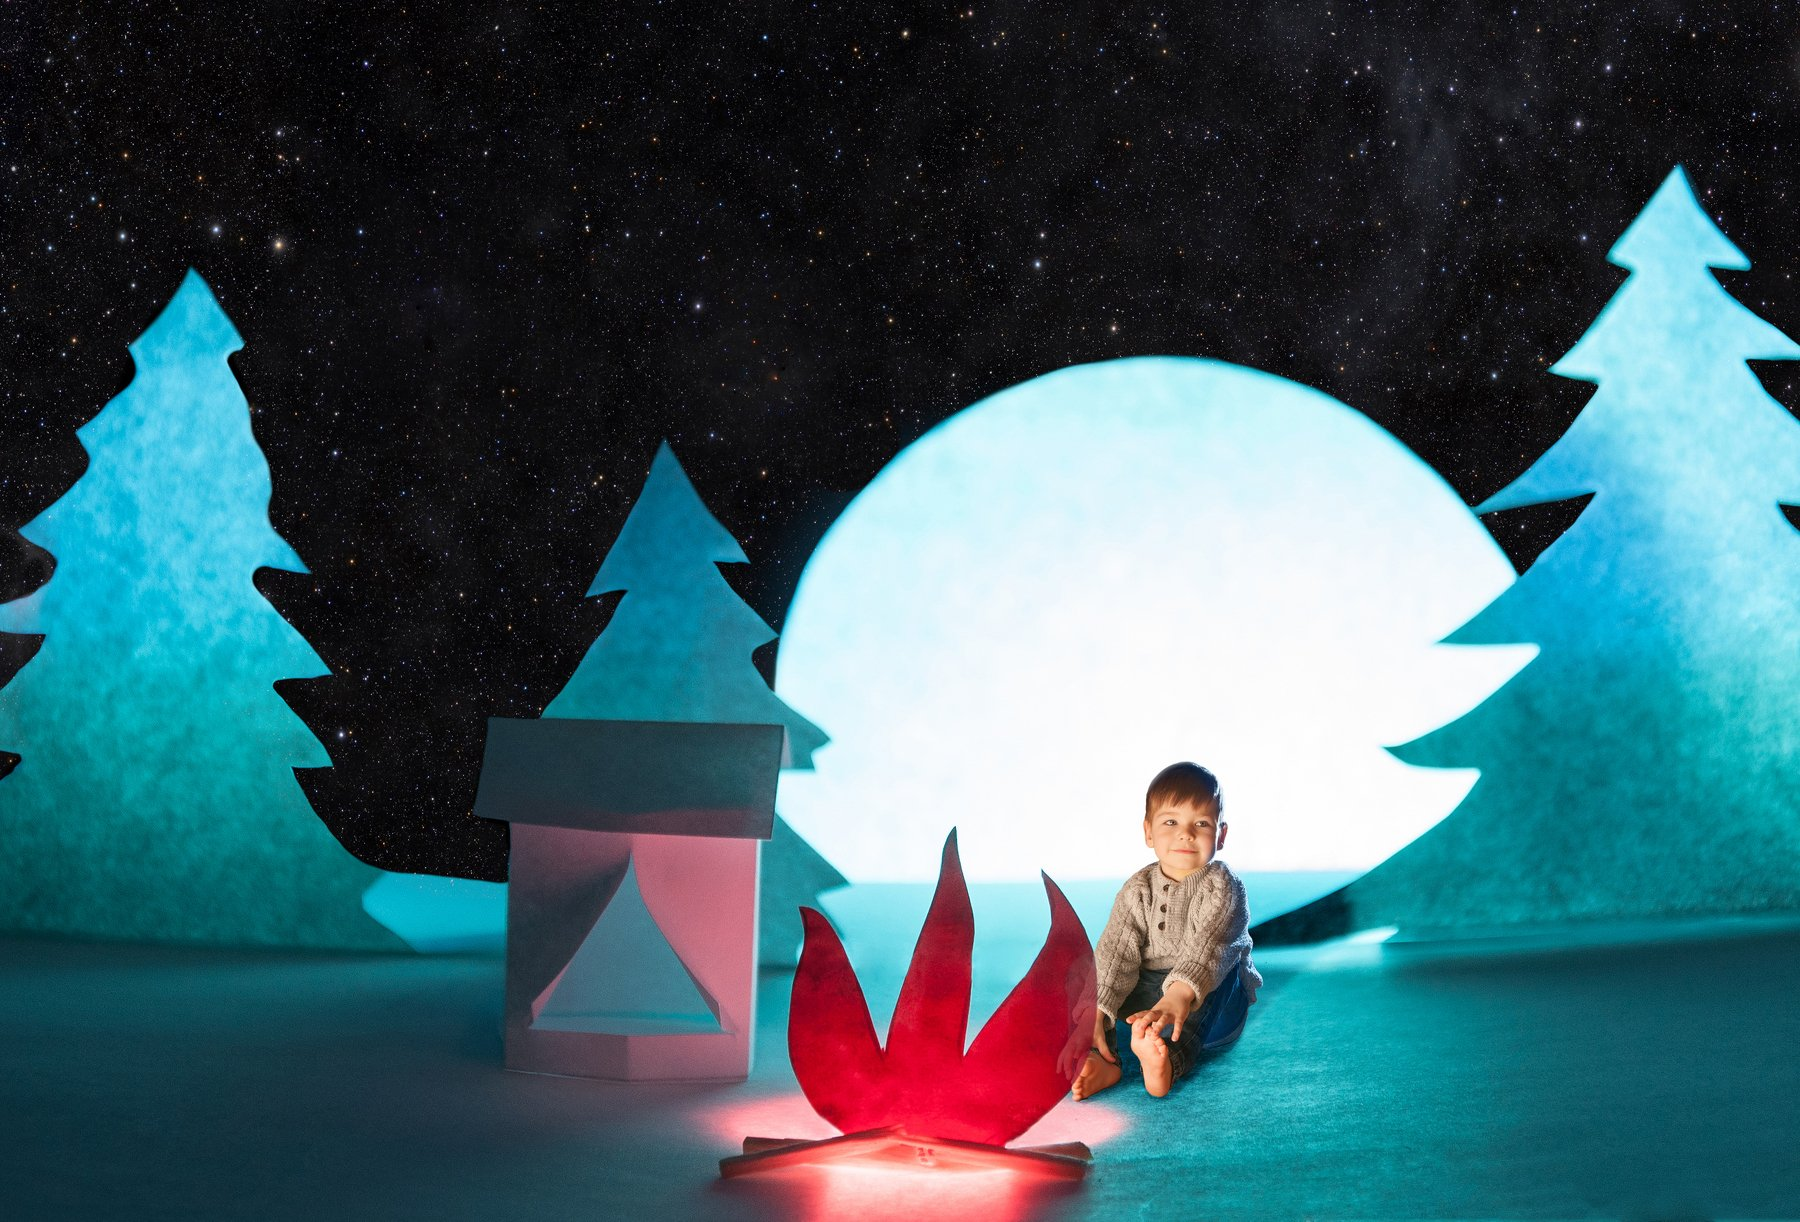 ночь, портрет, поход, луна, portrait, nikon, night, hiking, strobe light, бумага, звезды, палатка, Валентина Хорева